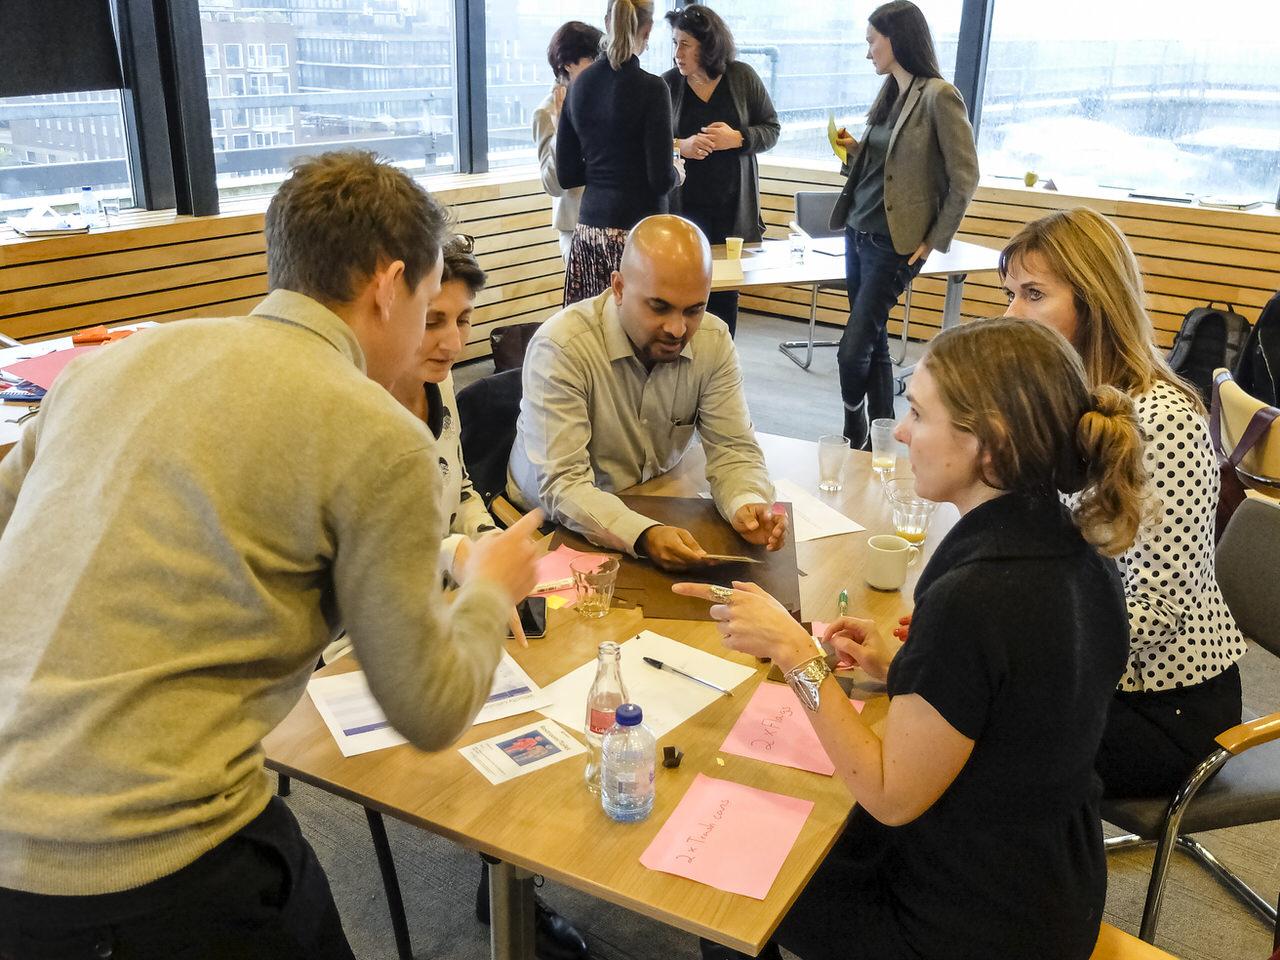 Training & Certification — AgileHR Community